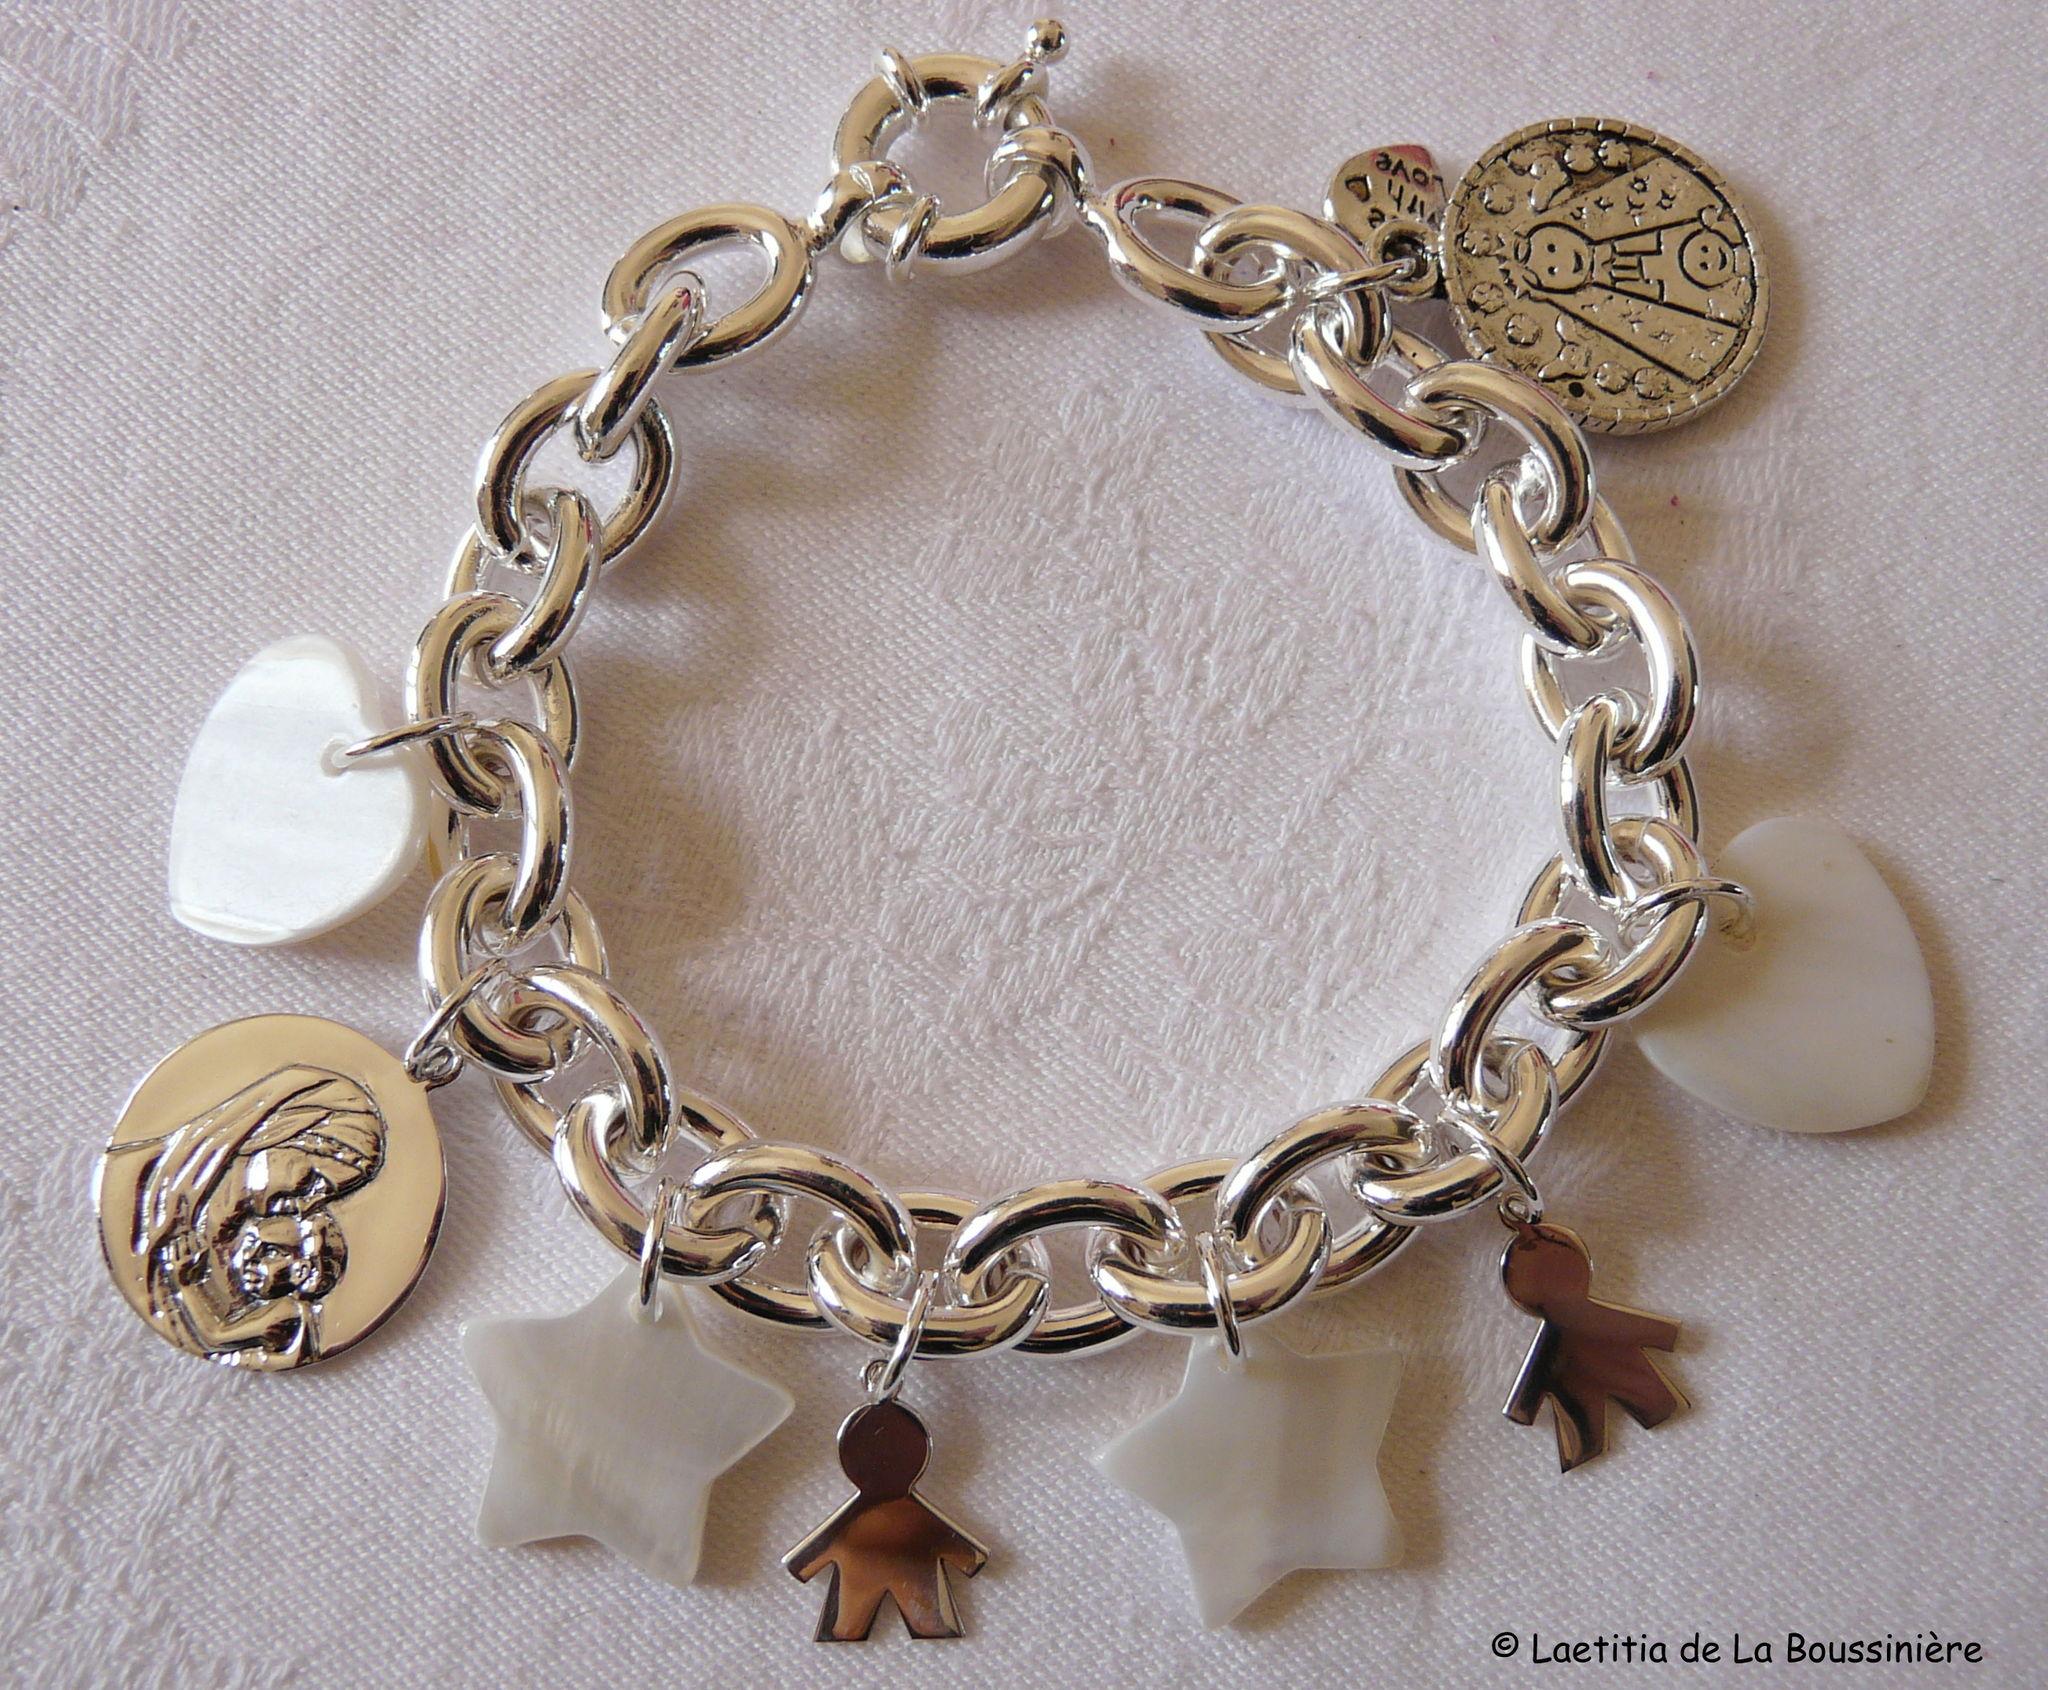 2. Les bijoux composés de breloques uniquement